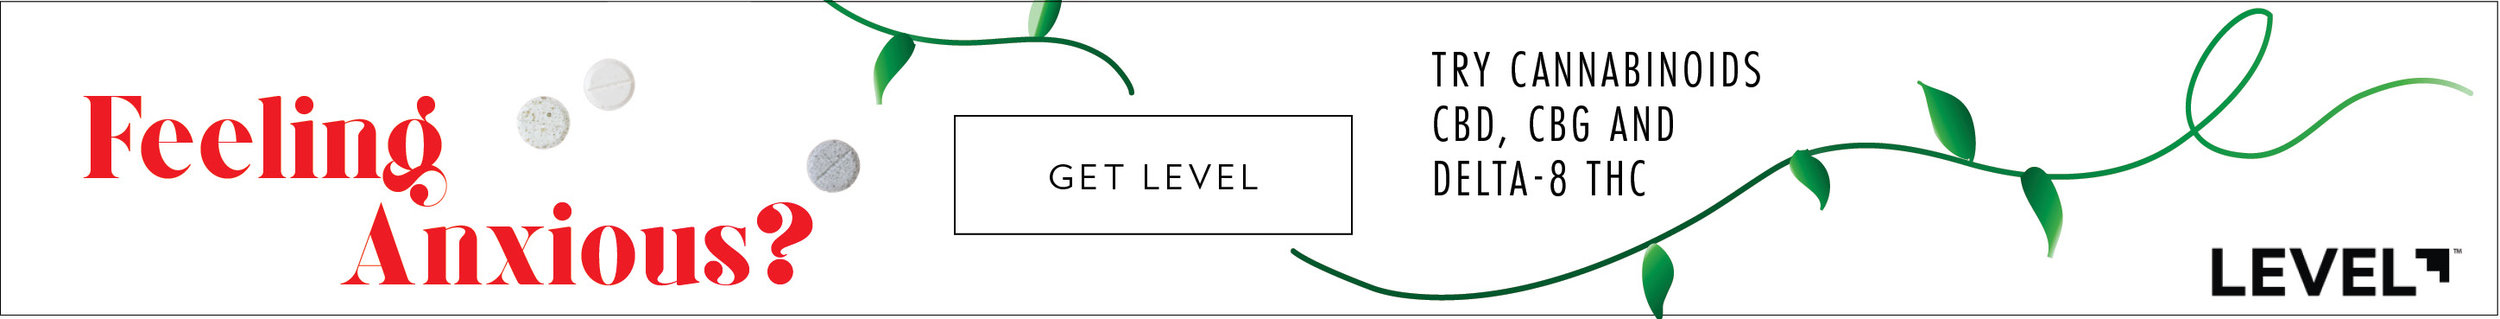 Level Banner Ad 4.jpg